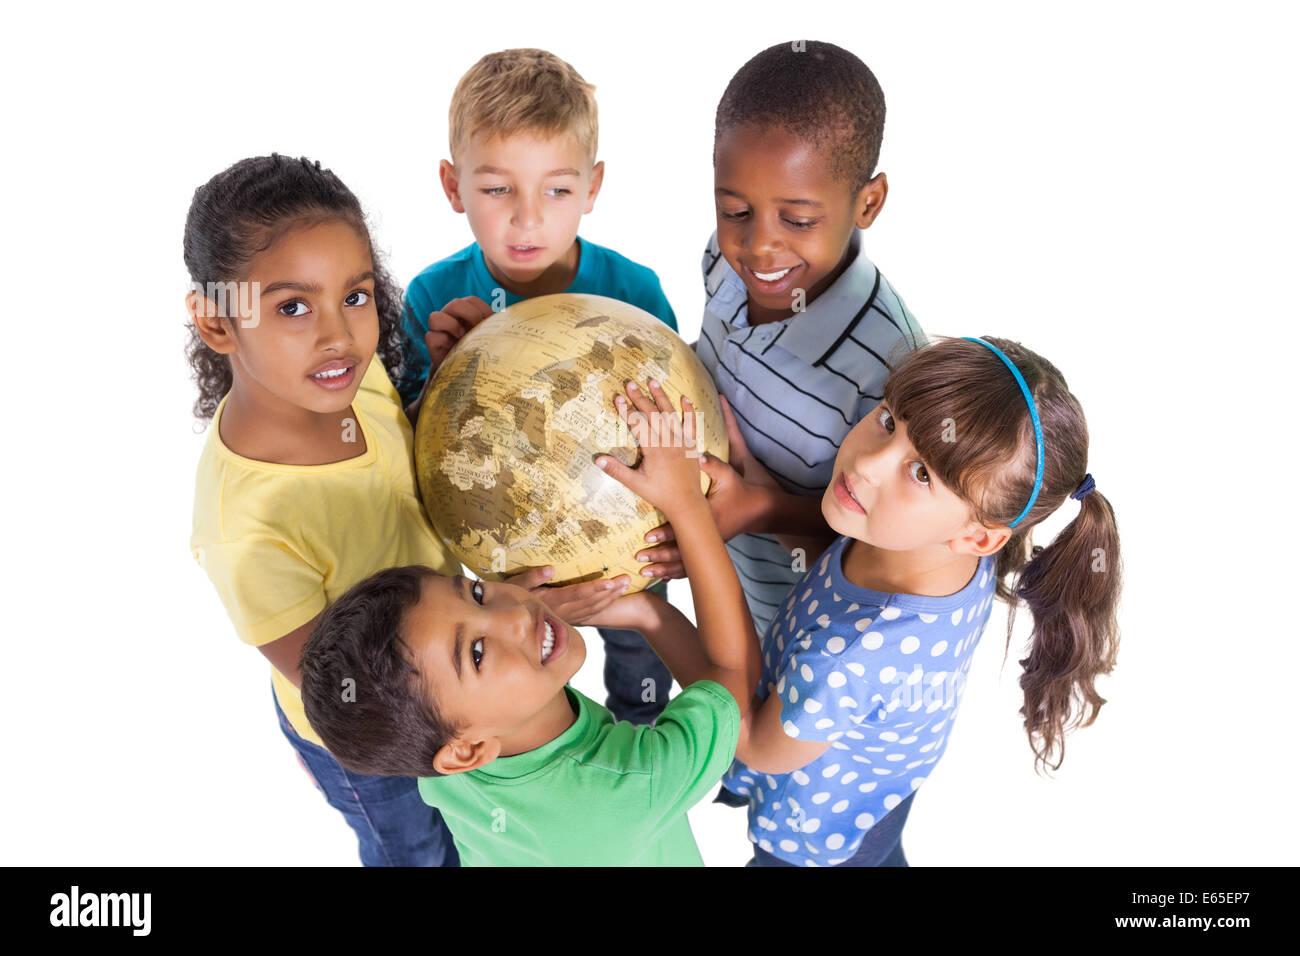 Cute schoolchildren smiling at camera holding globe - Stock Image